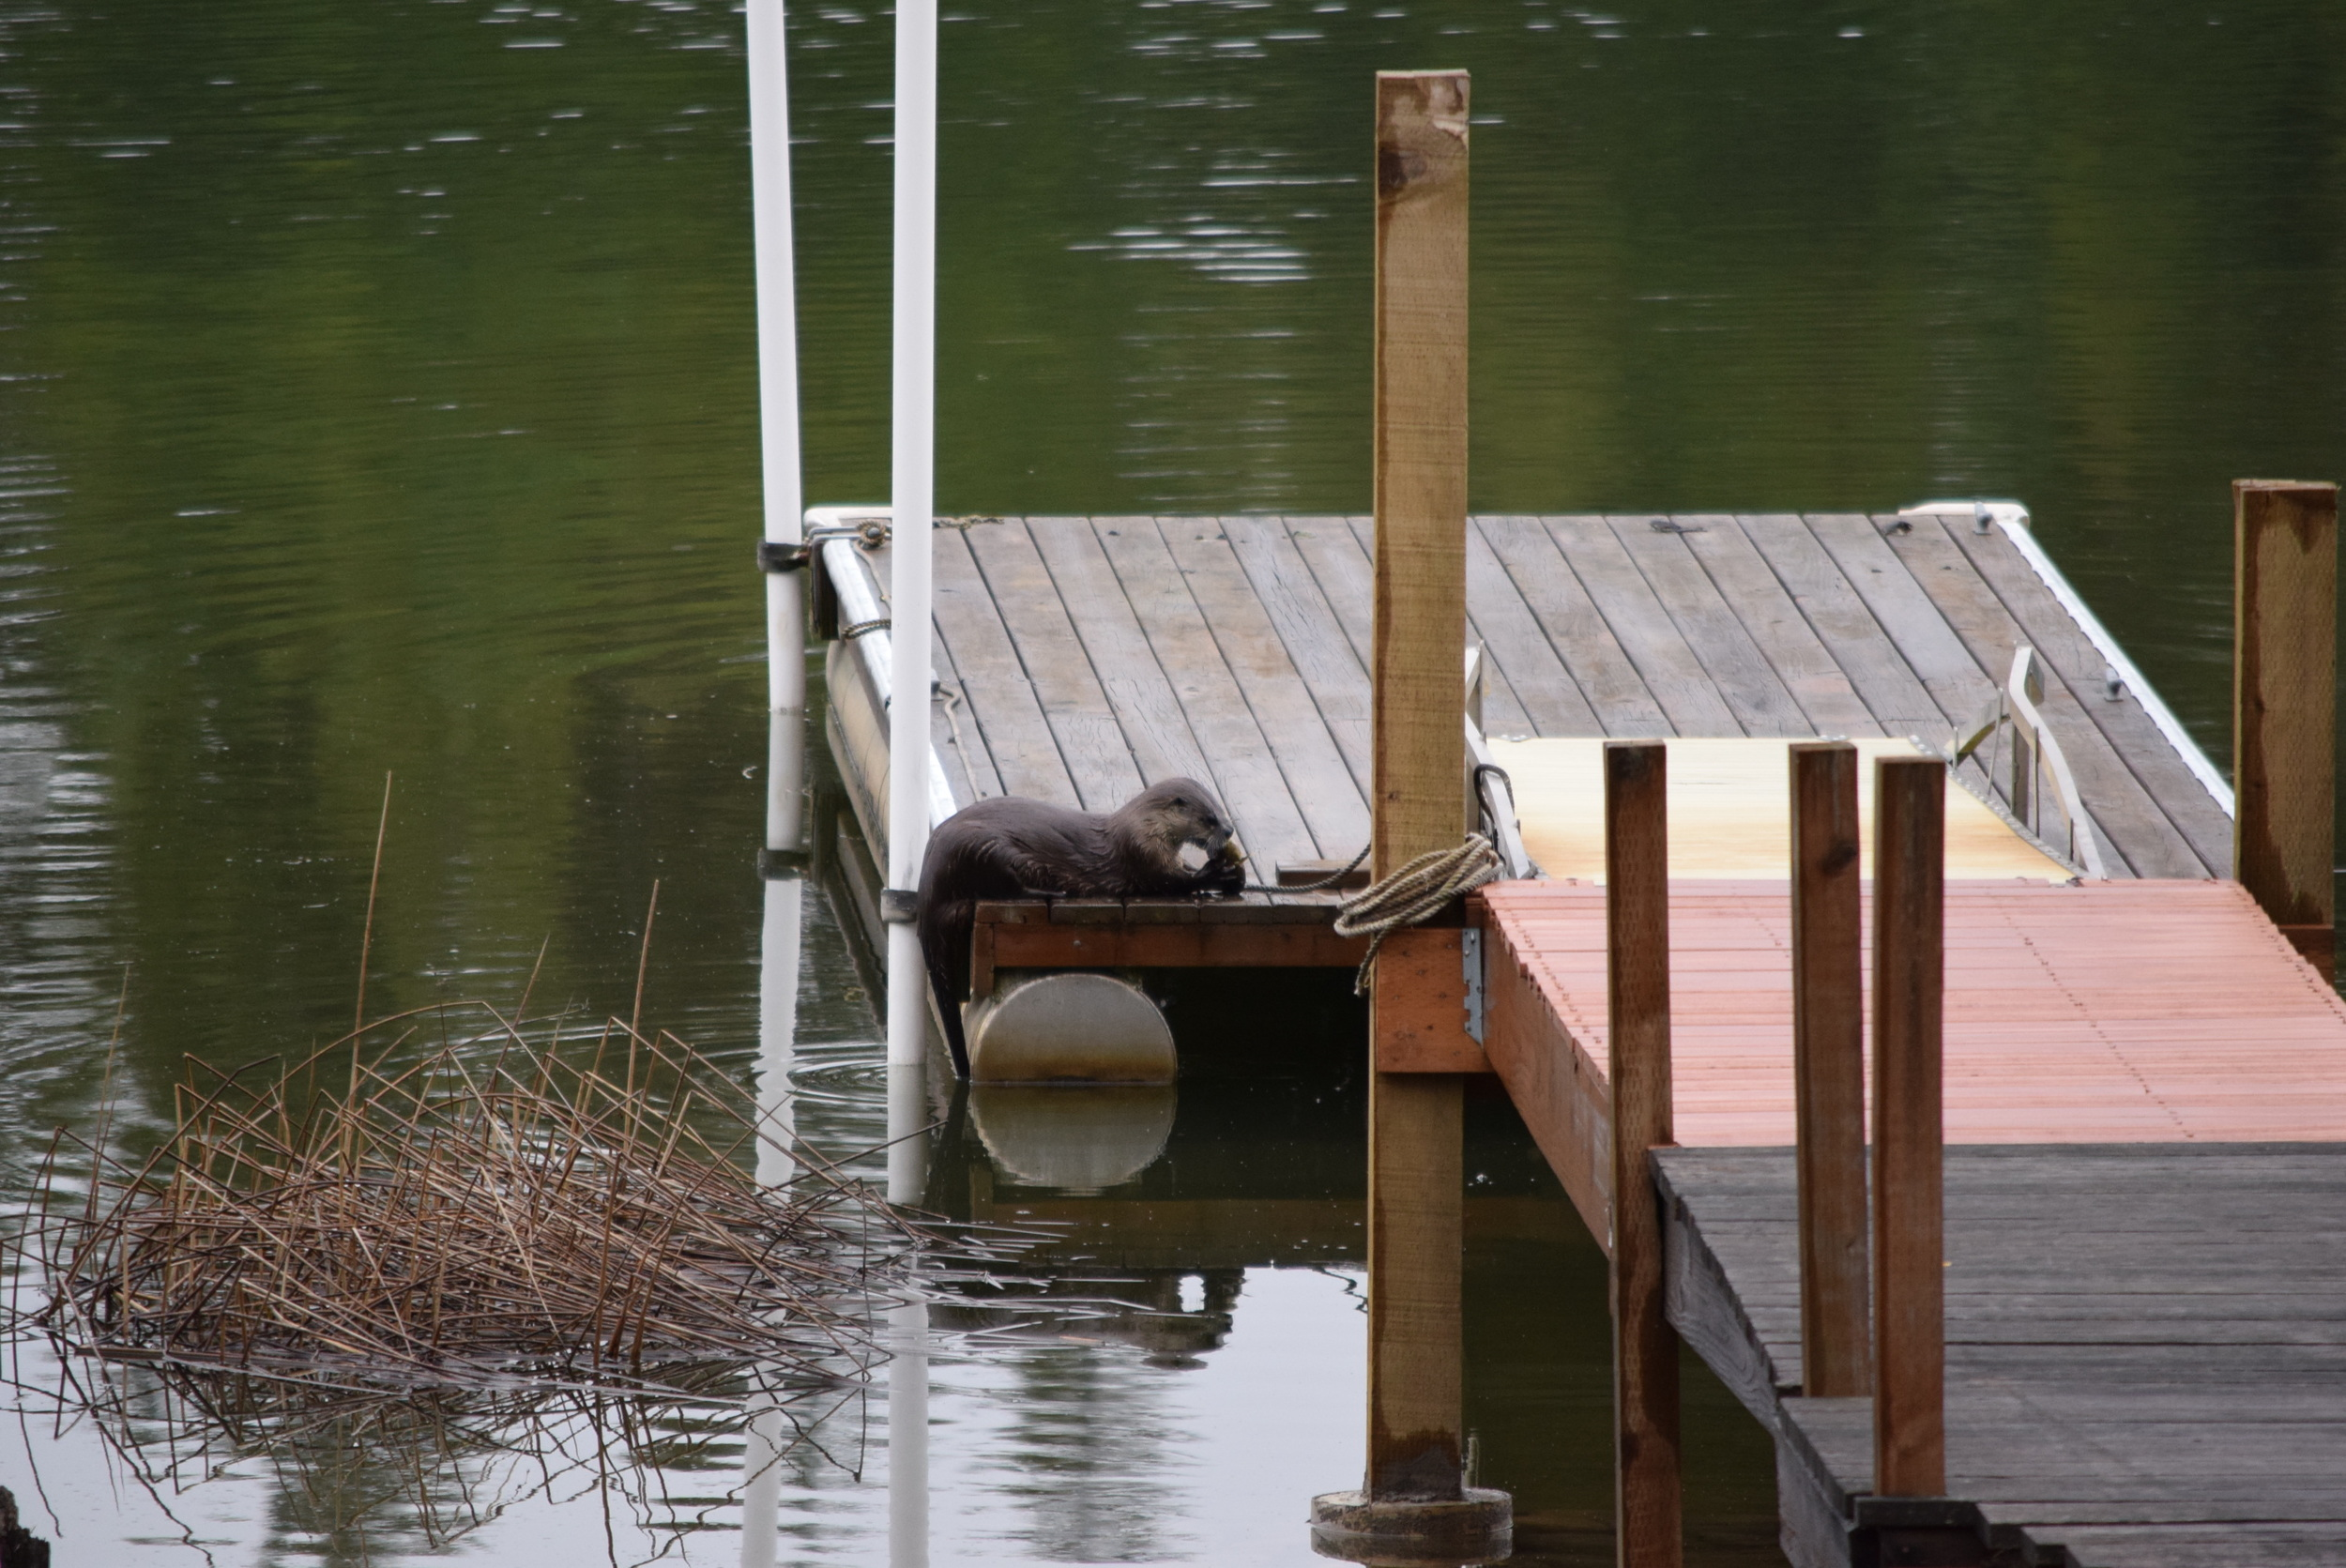 An otter, just having some dinner on the dock.